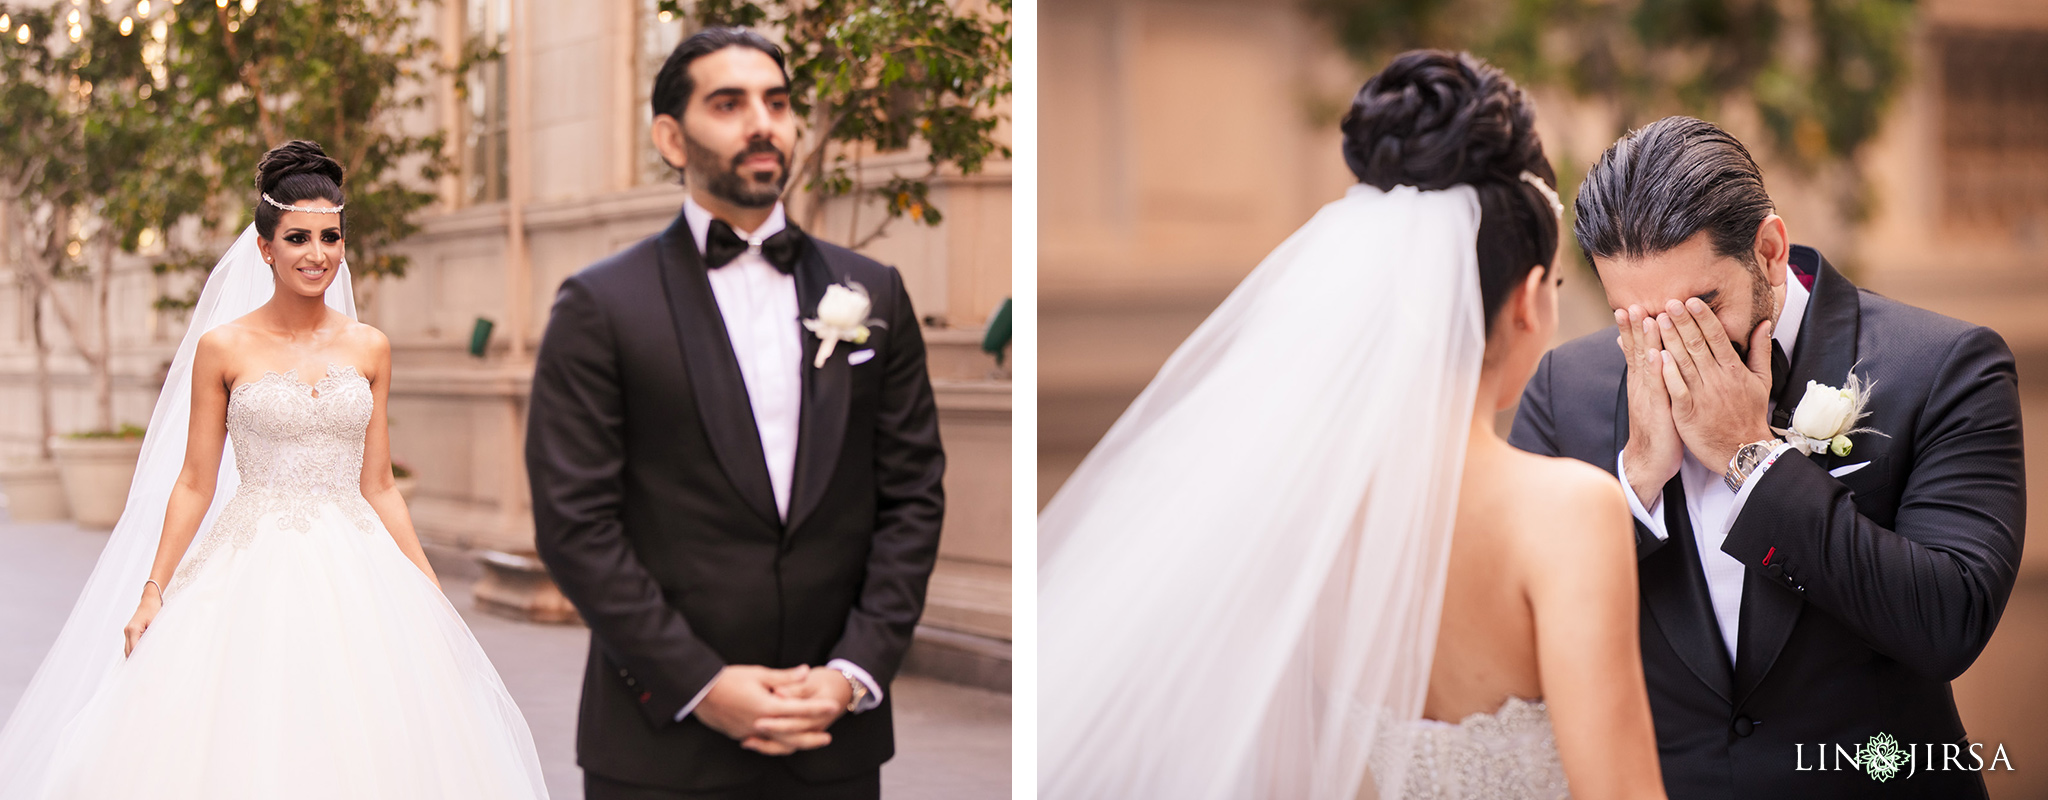 11 Biltmore Hotel Los Angeles Wedding Photography